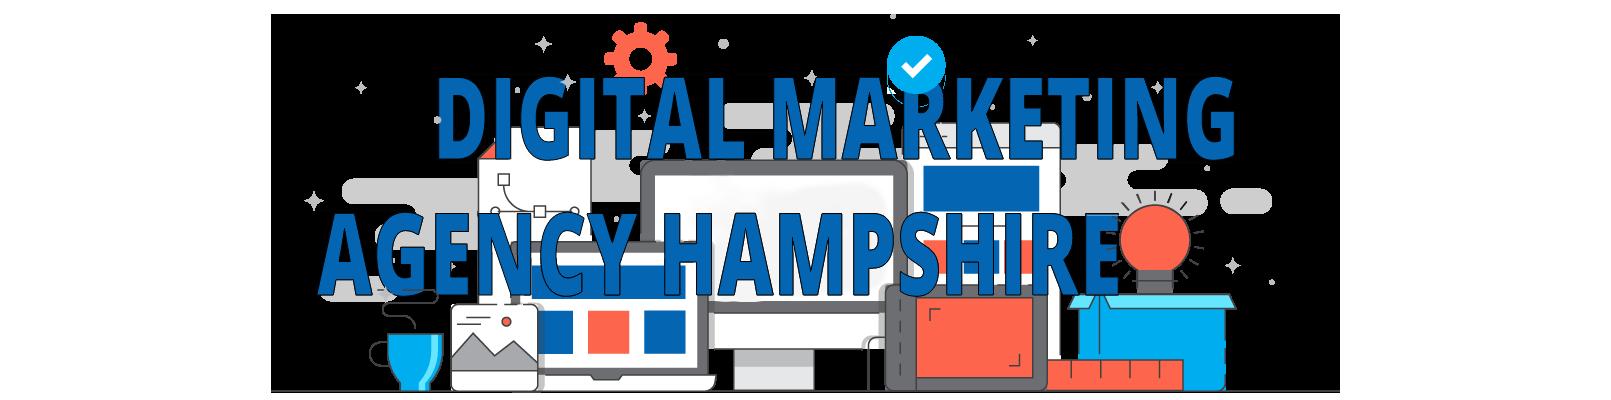 seek social digital marketing agency hampshire header with transparent header